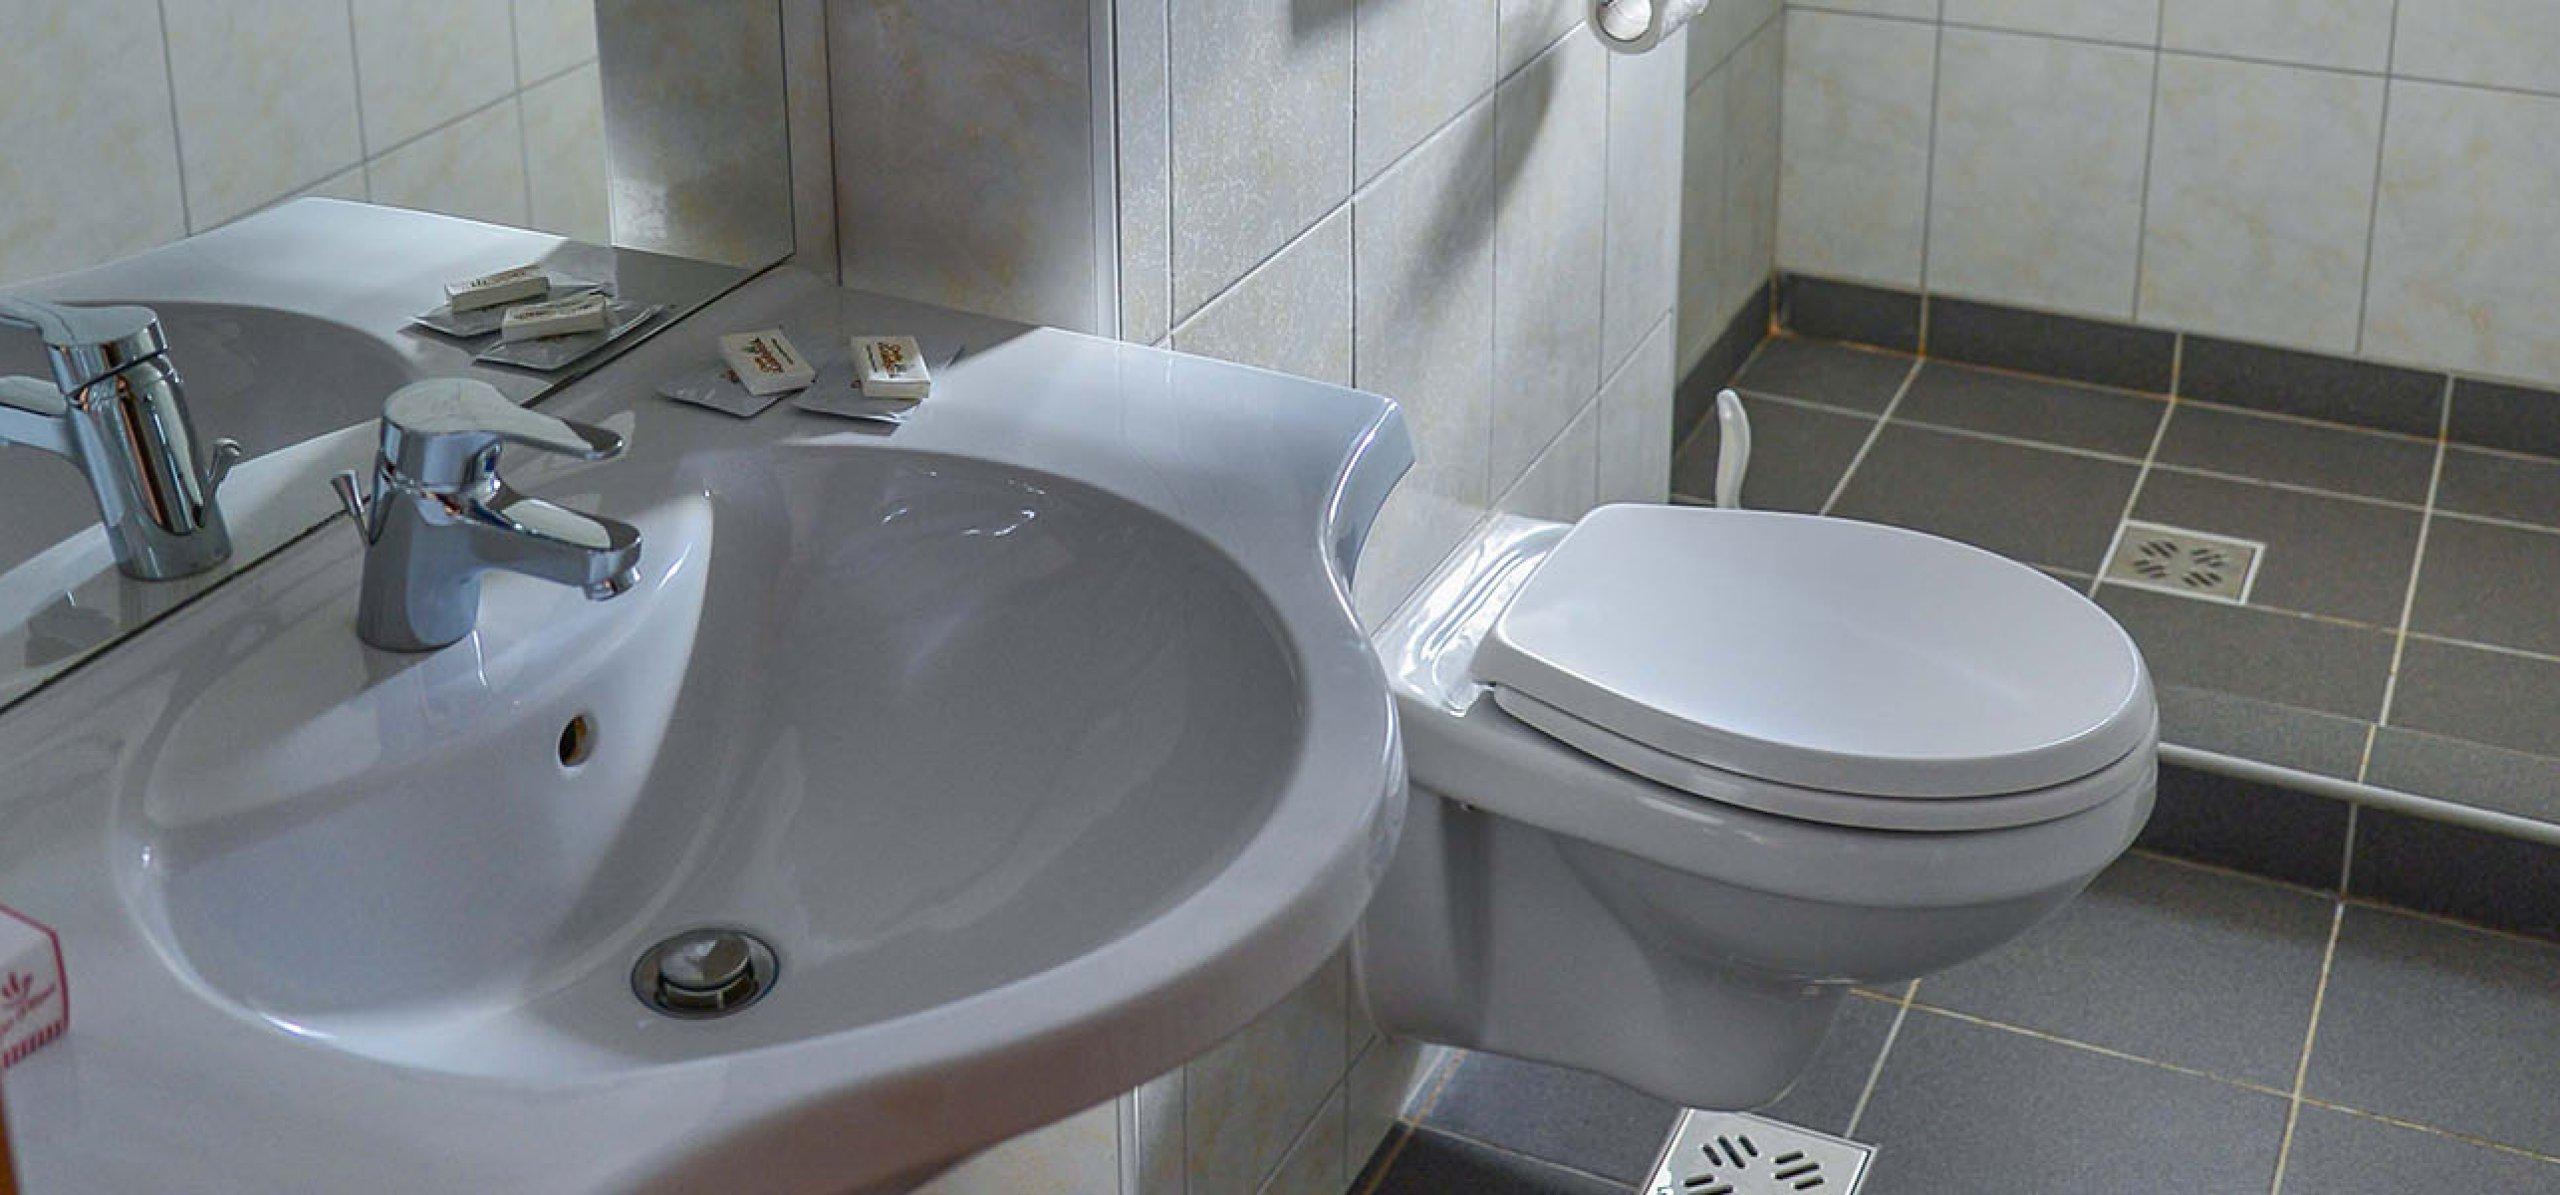 baie-spatioasa-hotel-sport-camera-dubla-cheile-gradistei-fundata